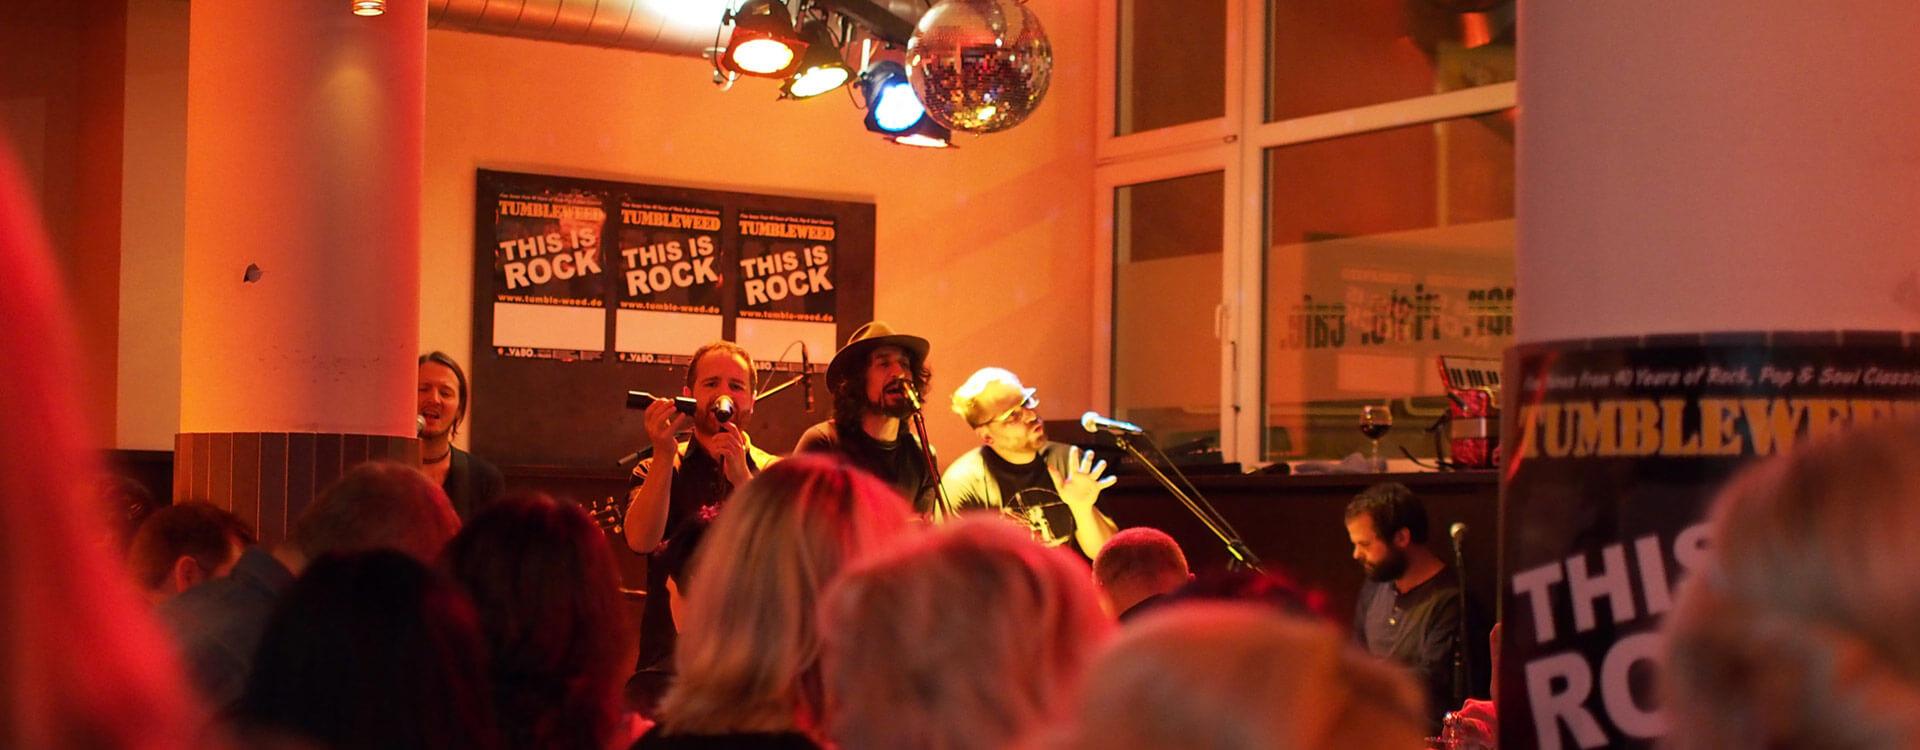 Thomas Steinköhler Trio & Acoustic Fight